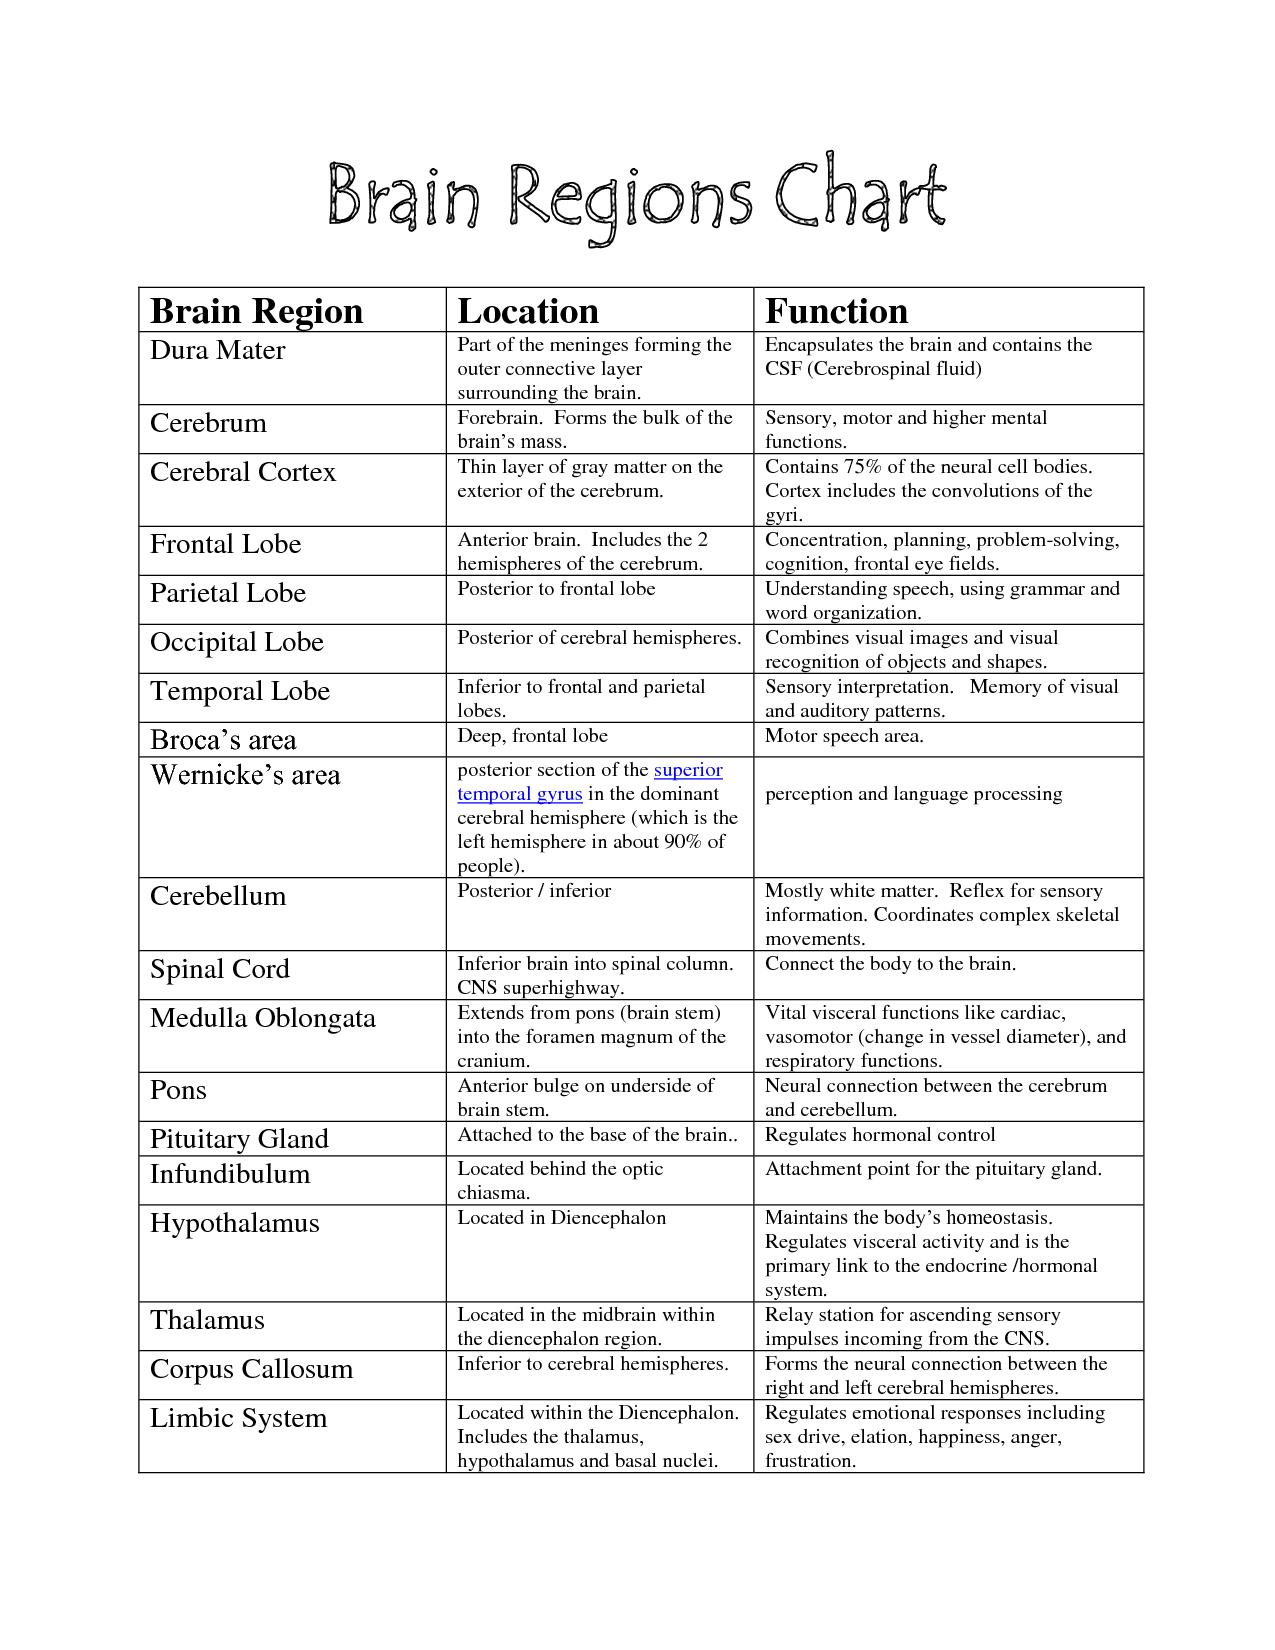 parts of the brain worksheet Termolak – Brain Worksheet